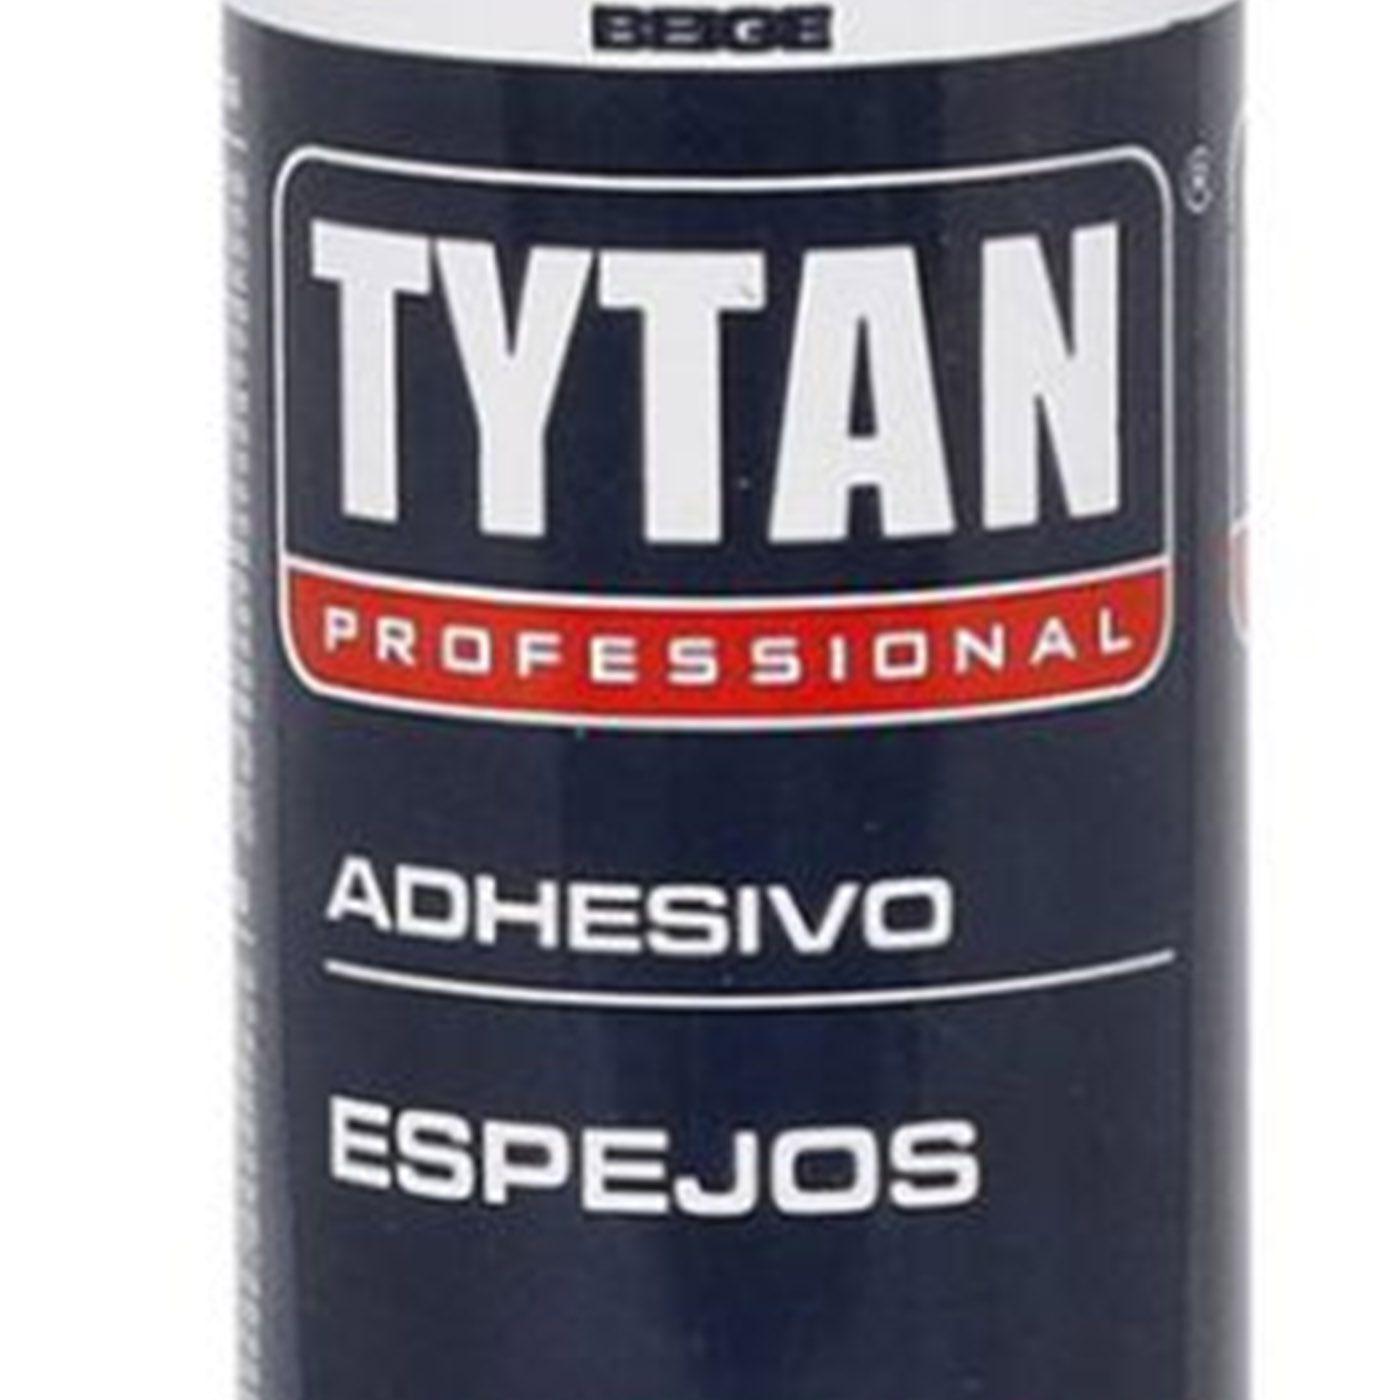 Adesivo Multiuso para Espelhos Tytan 320g